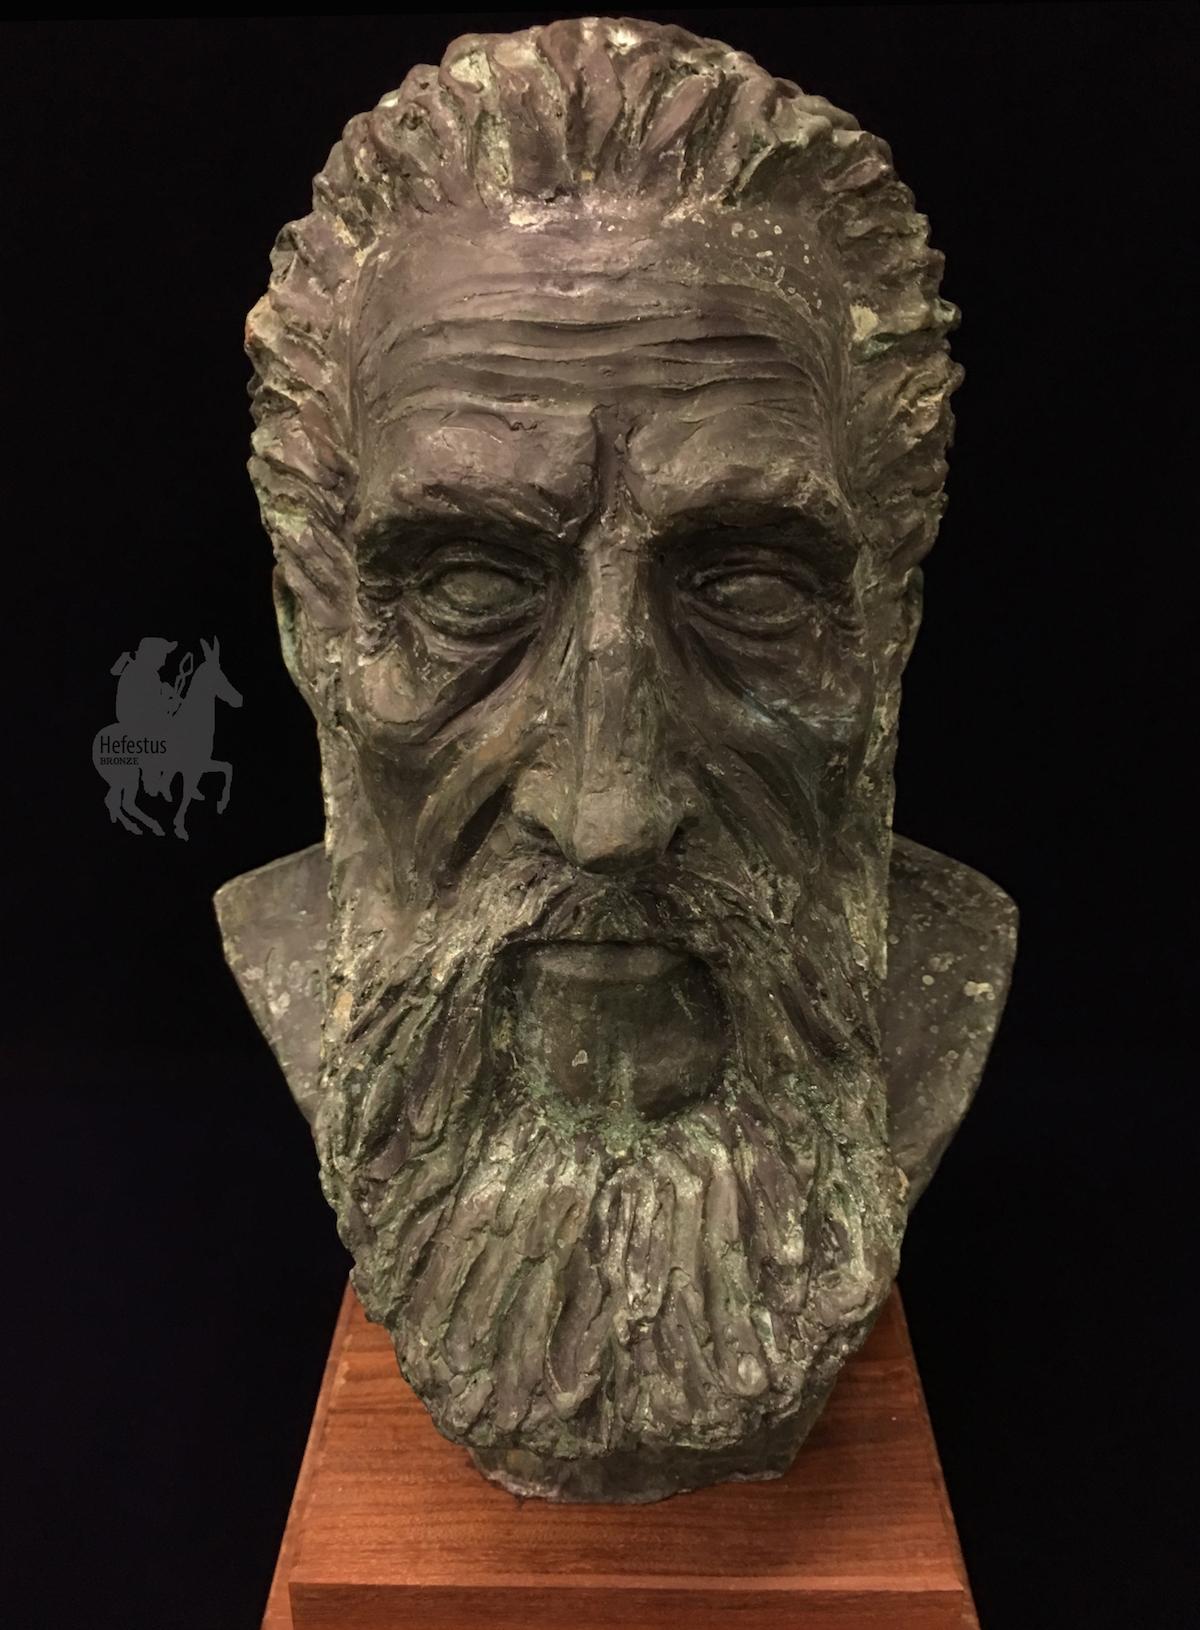 Michelangelo-ChrisDenham-3.jpg